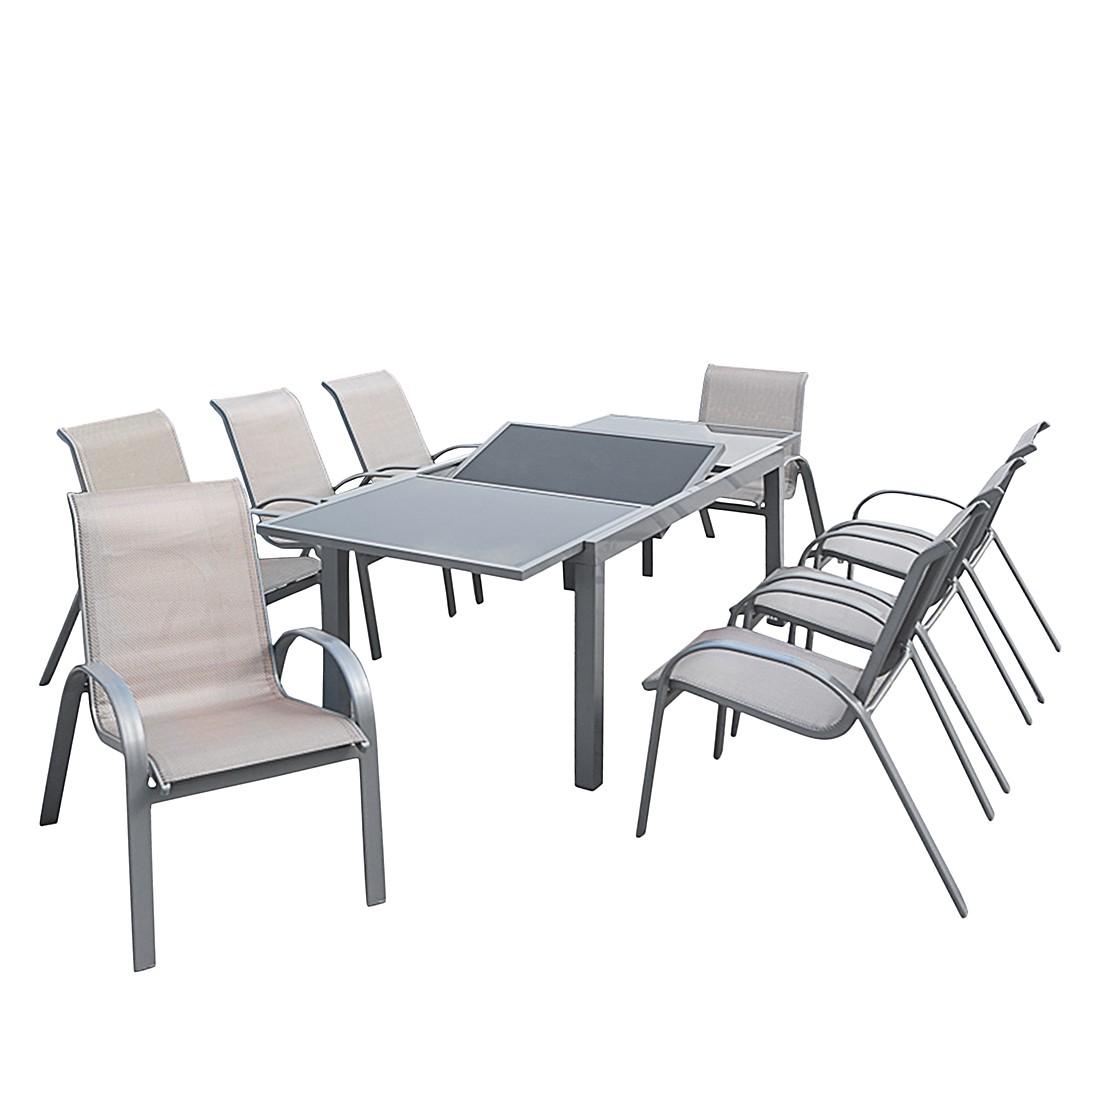 home24 Gartenessgruppe Amalfi I (9-teilig)   Garten > Gartenmöbel > Gartenmöbel-Set   Braun   Glas - Metall   Merxx